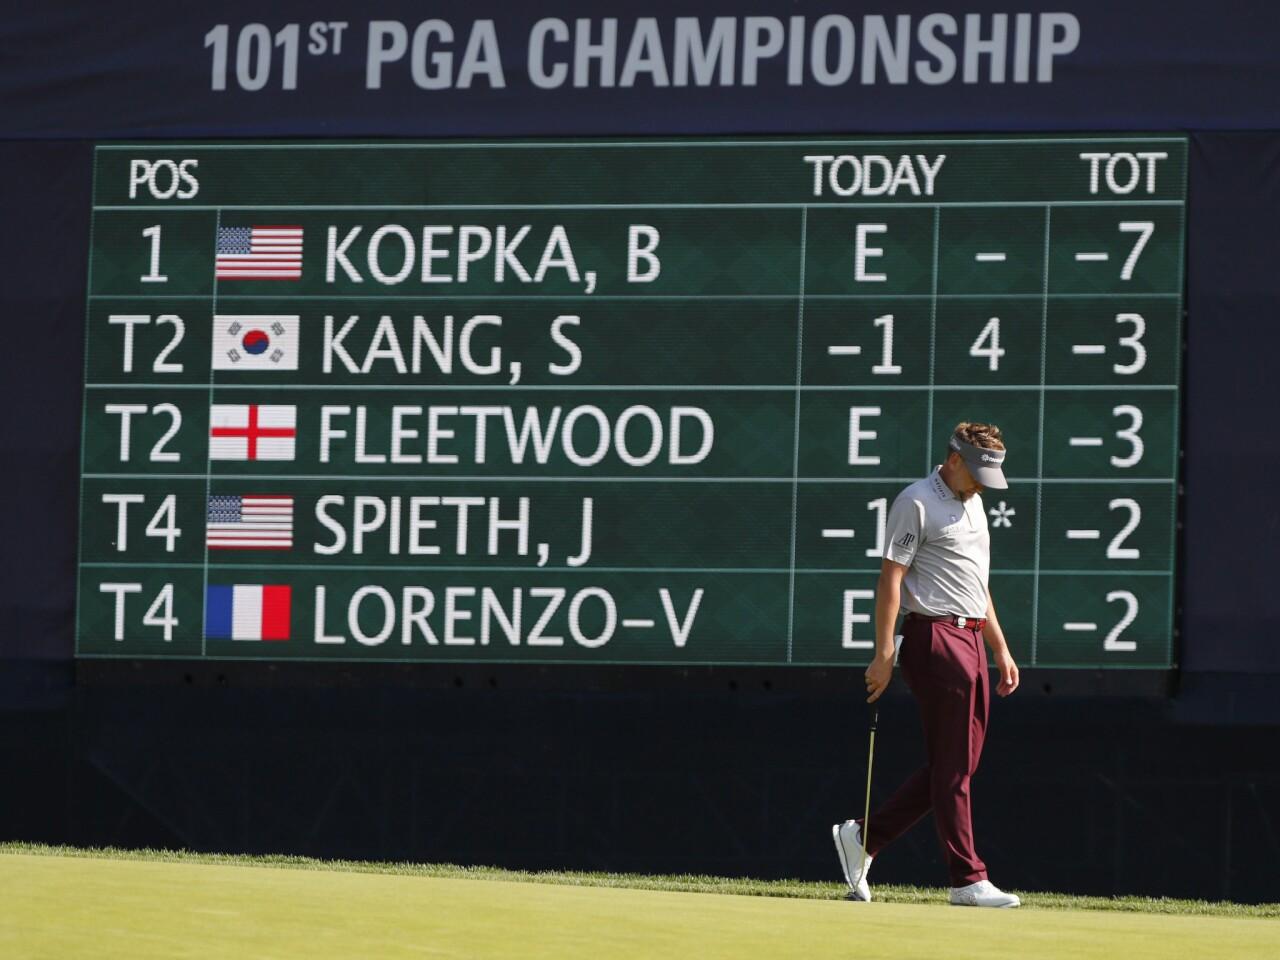 2019 PGA Championship | Round 2